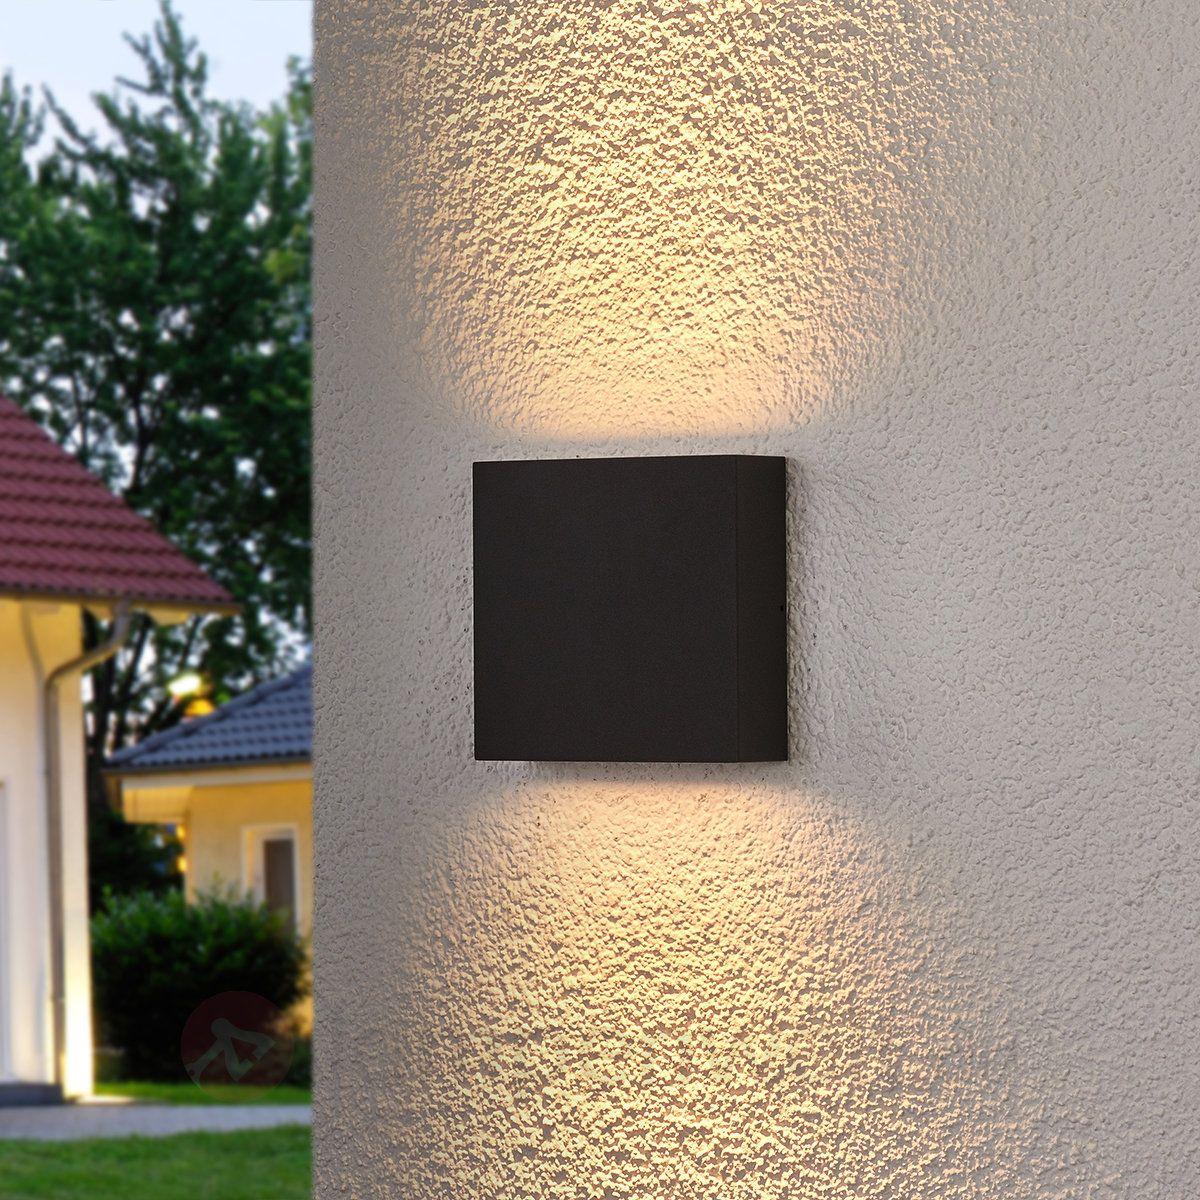 Bezaubernd Eingangsüberdachung L Form Beste Wahl Eckige Led-außenwandlampe Trixy In Grafitgrau Sicher &